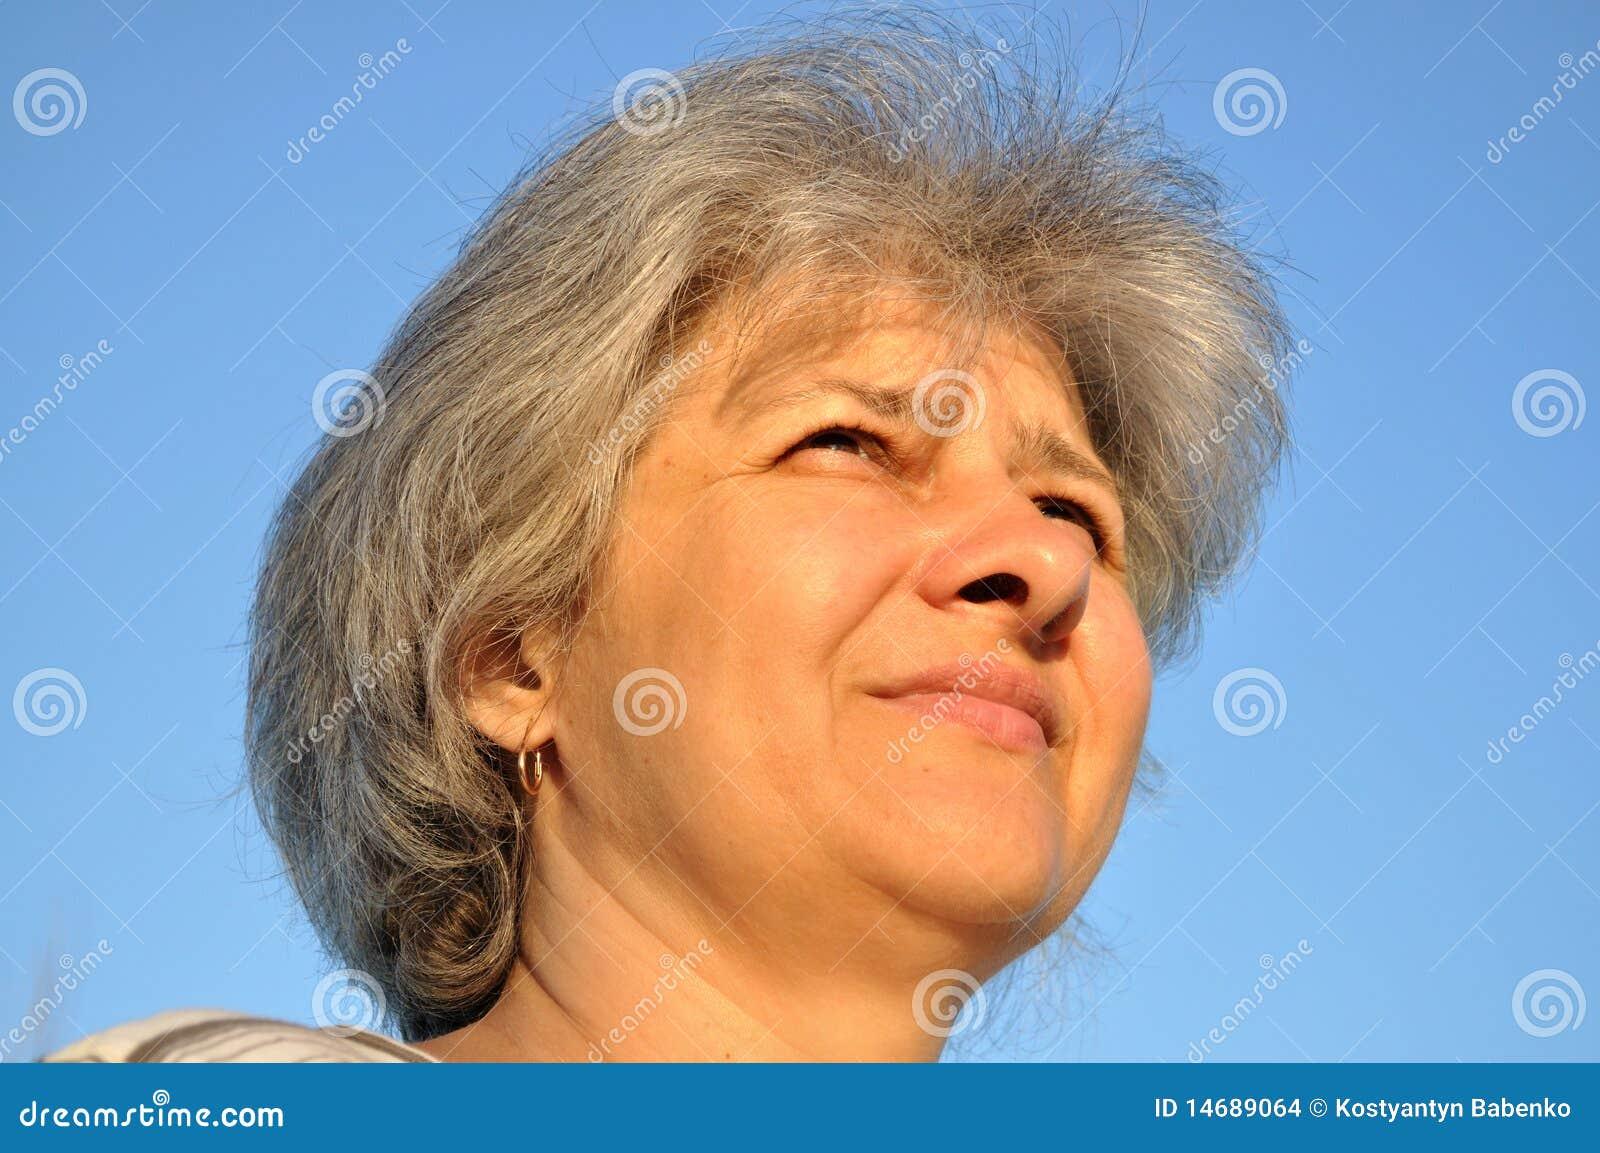 Portrait of an elderly woman, his eyes set forward, smiling.